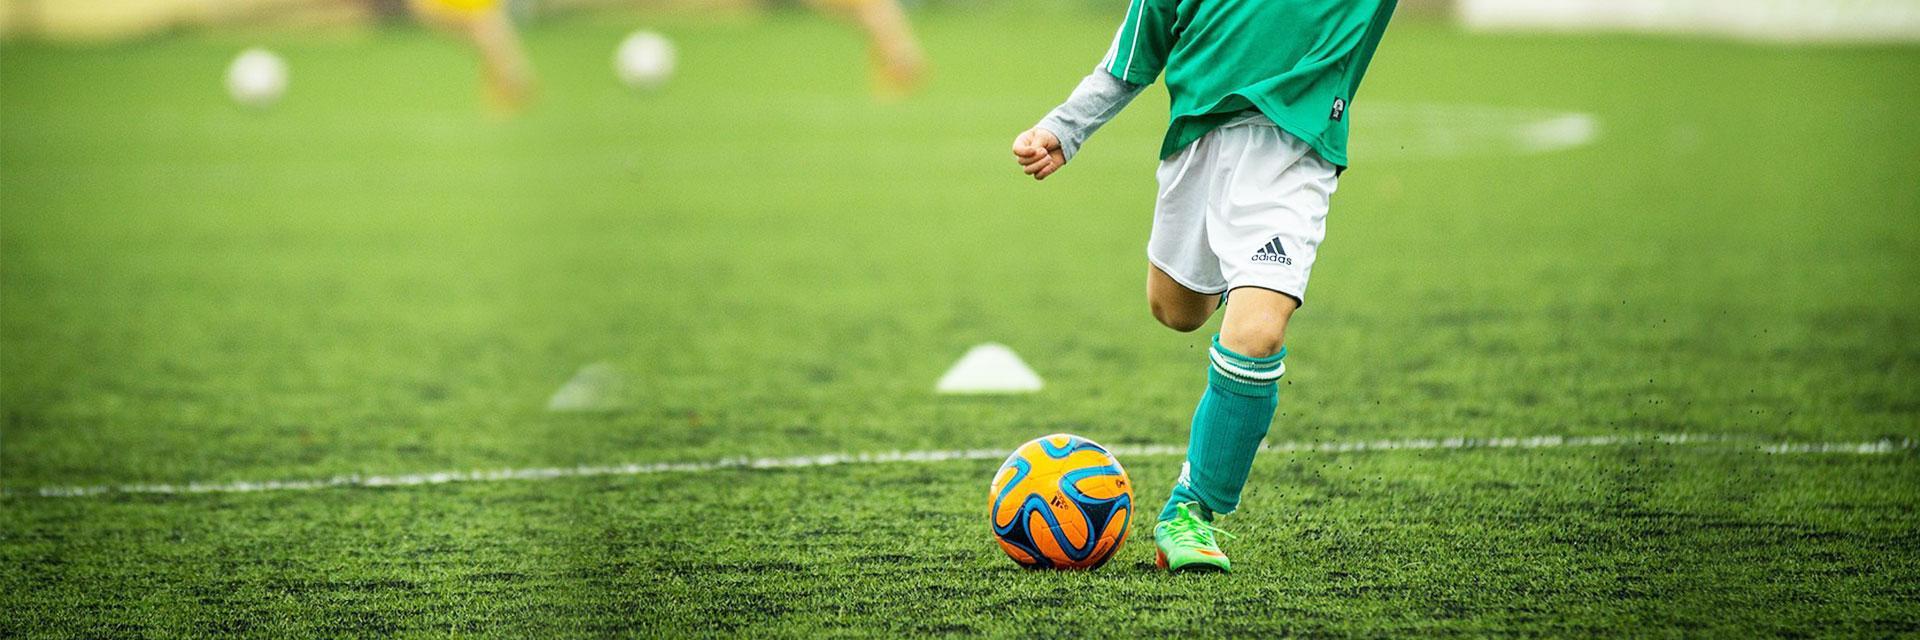 BDFA's new season kicks off today